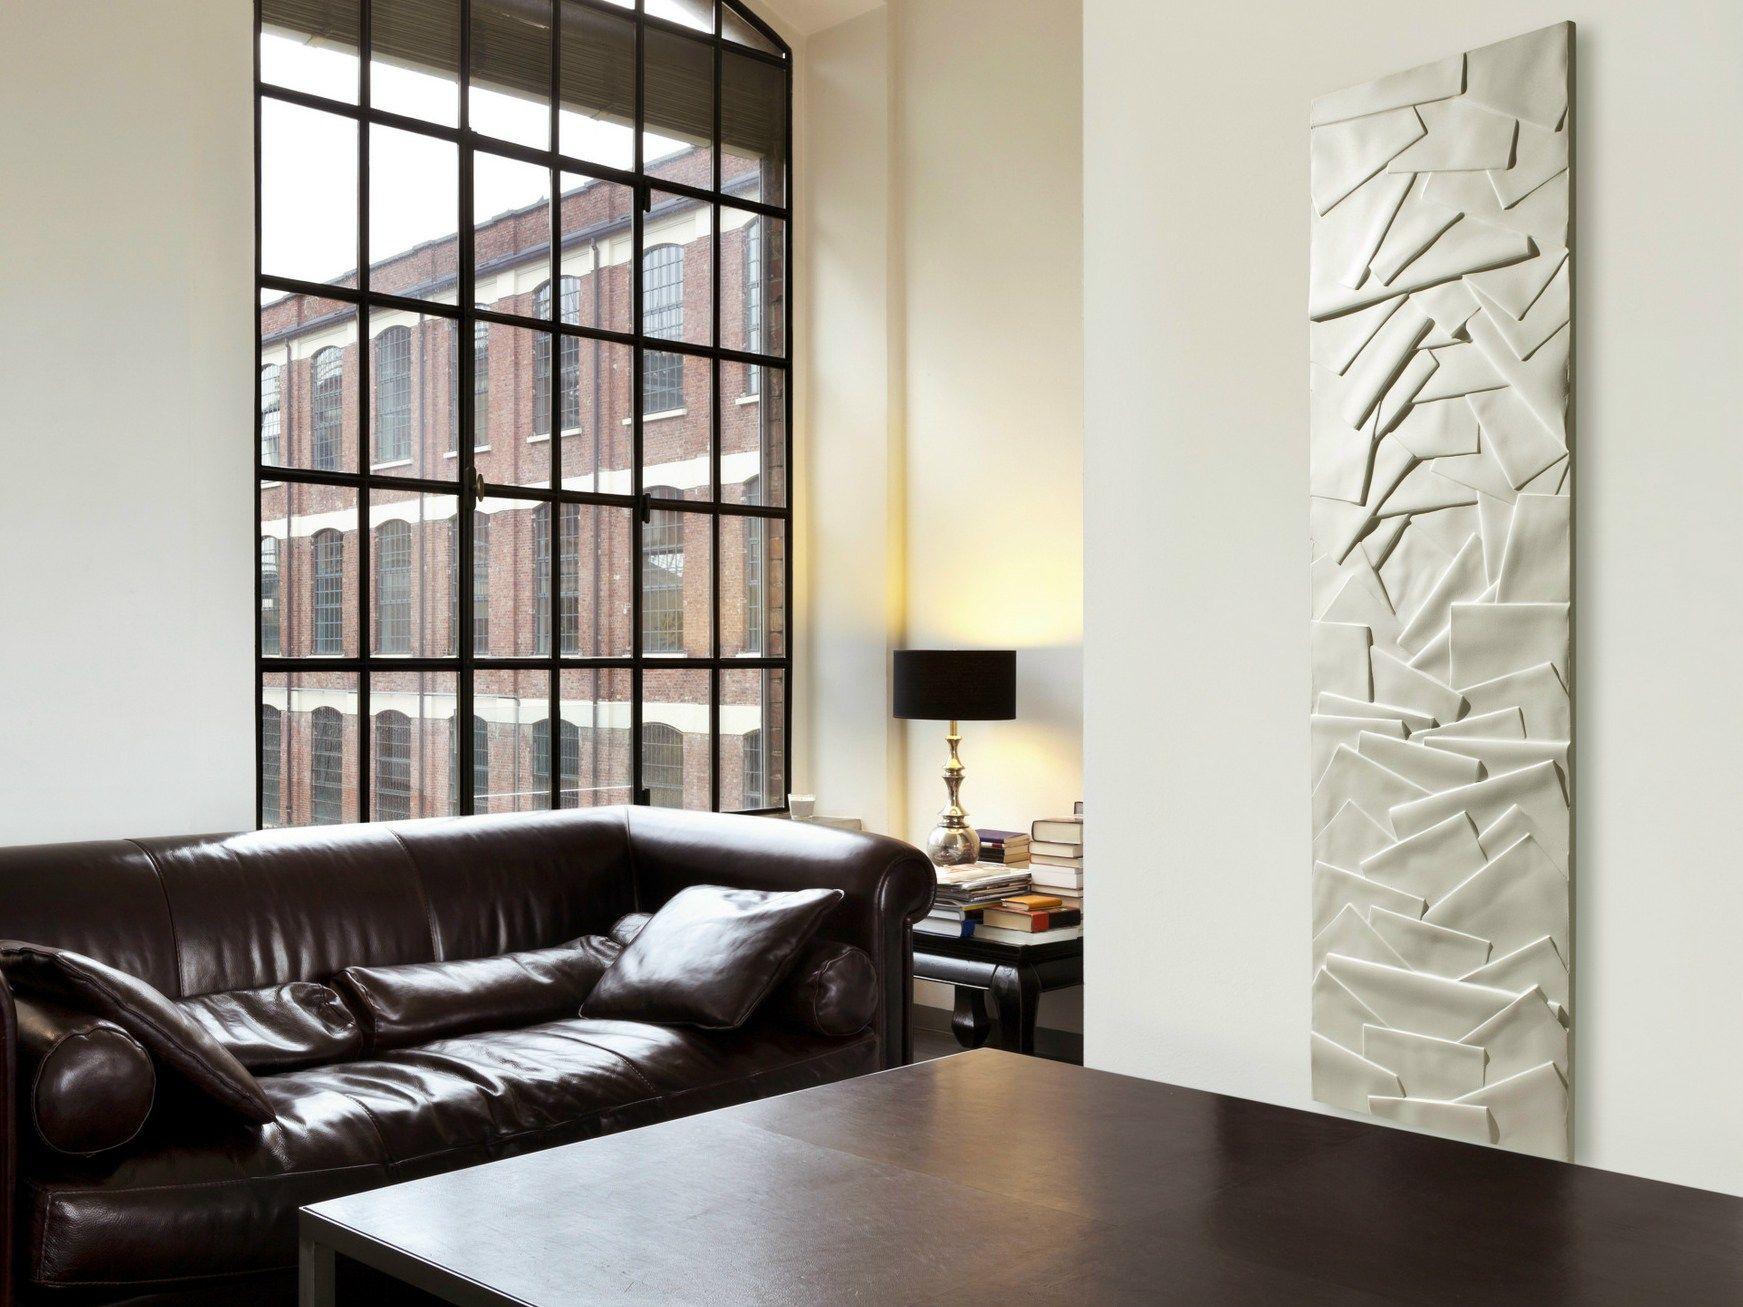 radiateur d coratif panneau vertical en olycale edo by. Black Bedroom Furniture Sets. Home Design Ideas